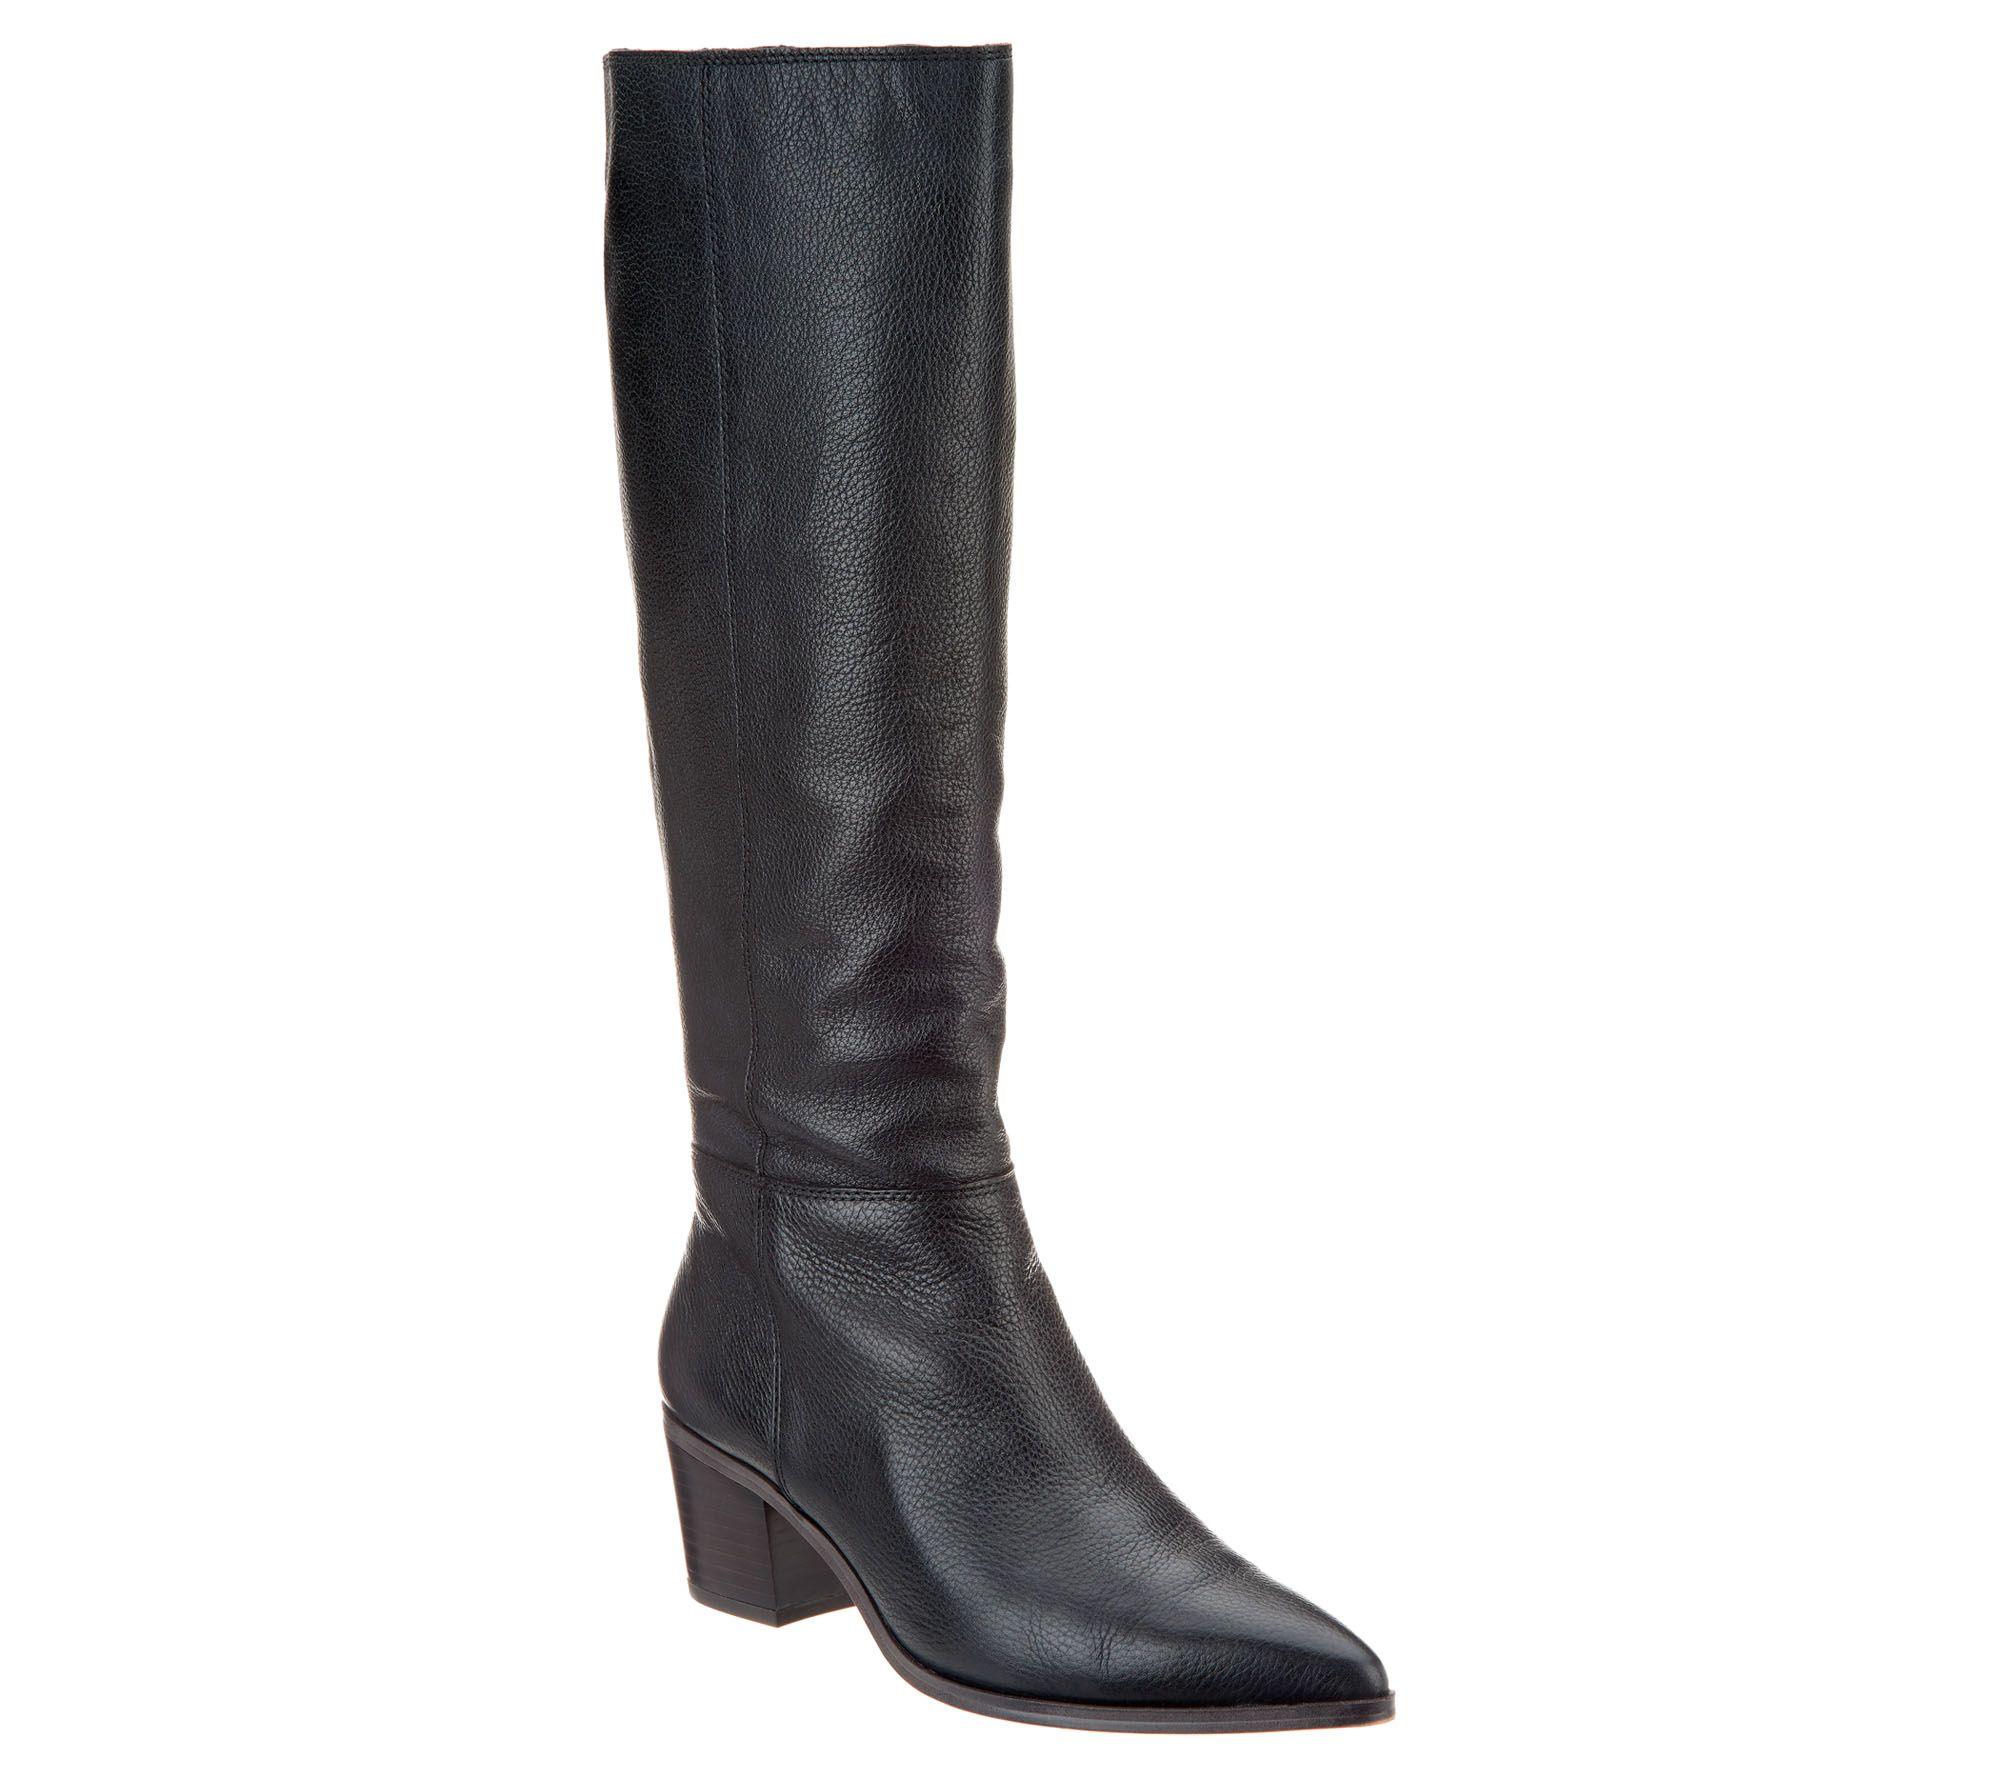 671ea5e20f9 Franco Sarto Leather or Suede Tall Shaft Boots - Sharona - Page 1 — QVC.com